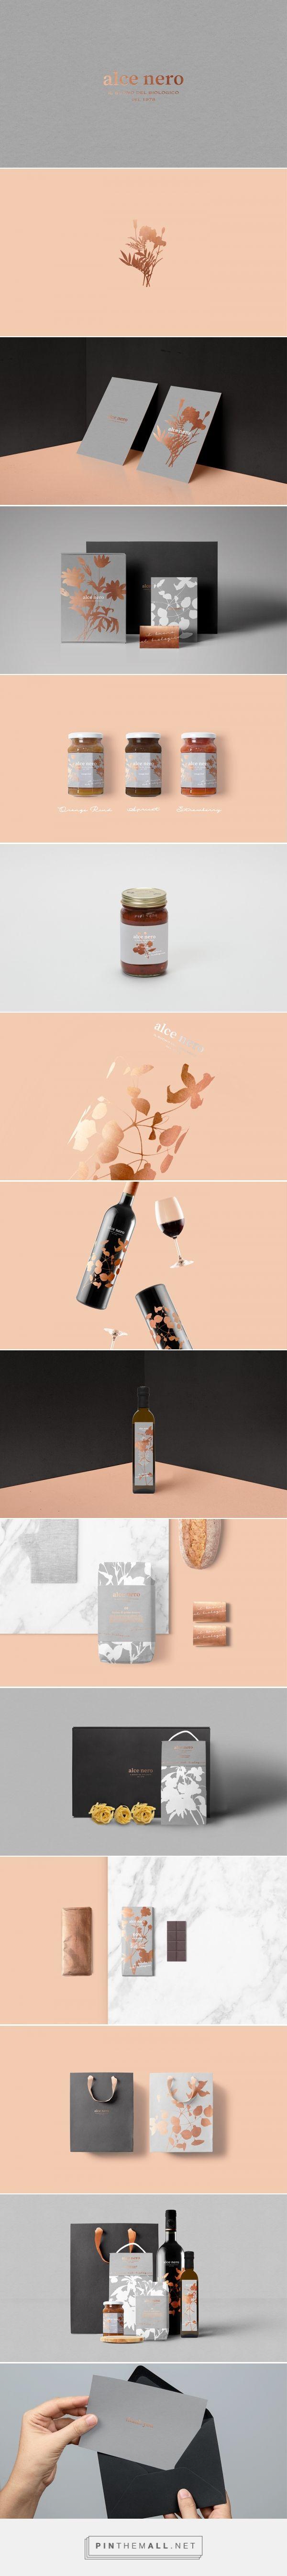 Alce Nero | Packaging Redesign on Behance | Fivestar Branding – Design and…